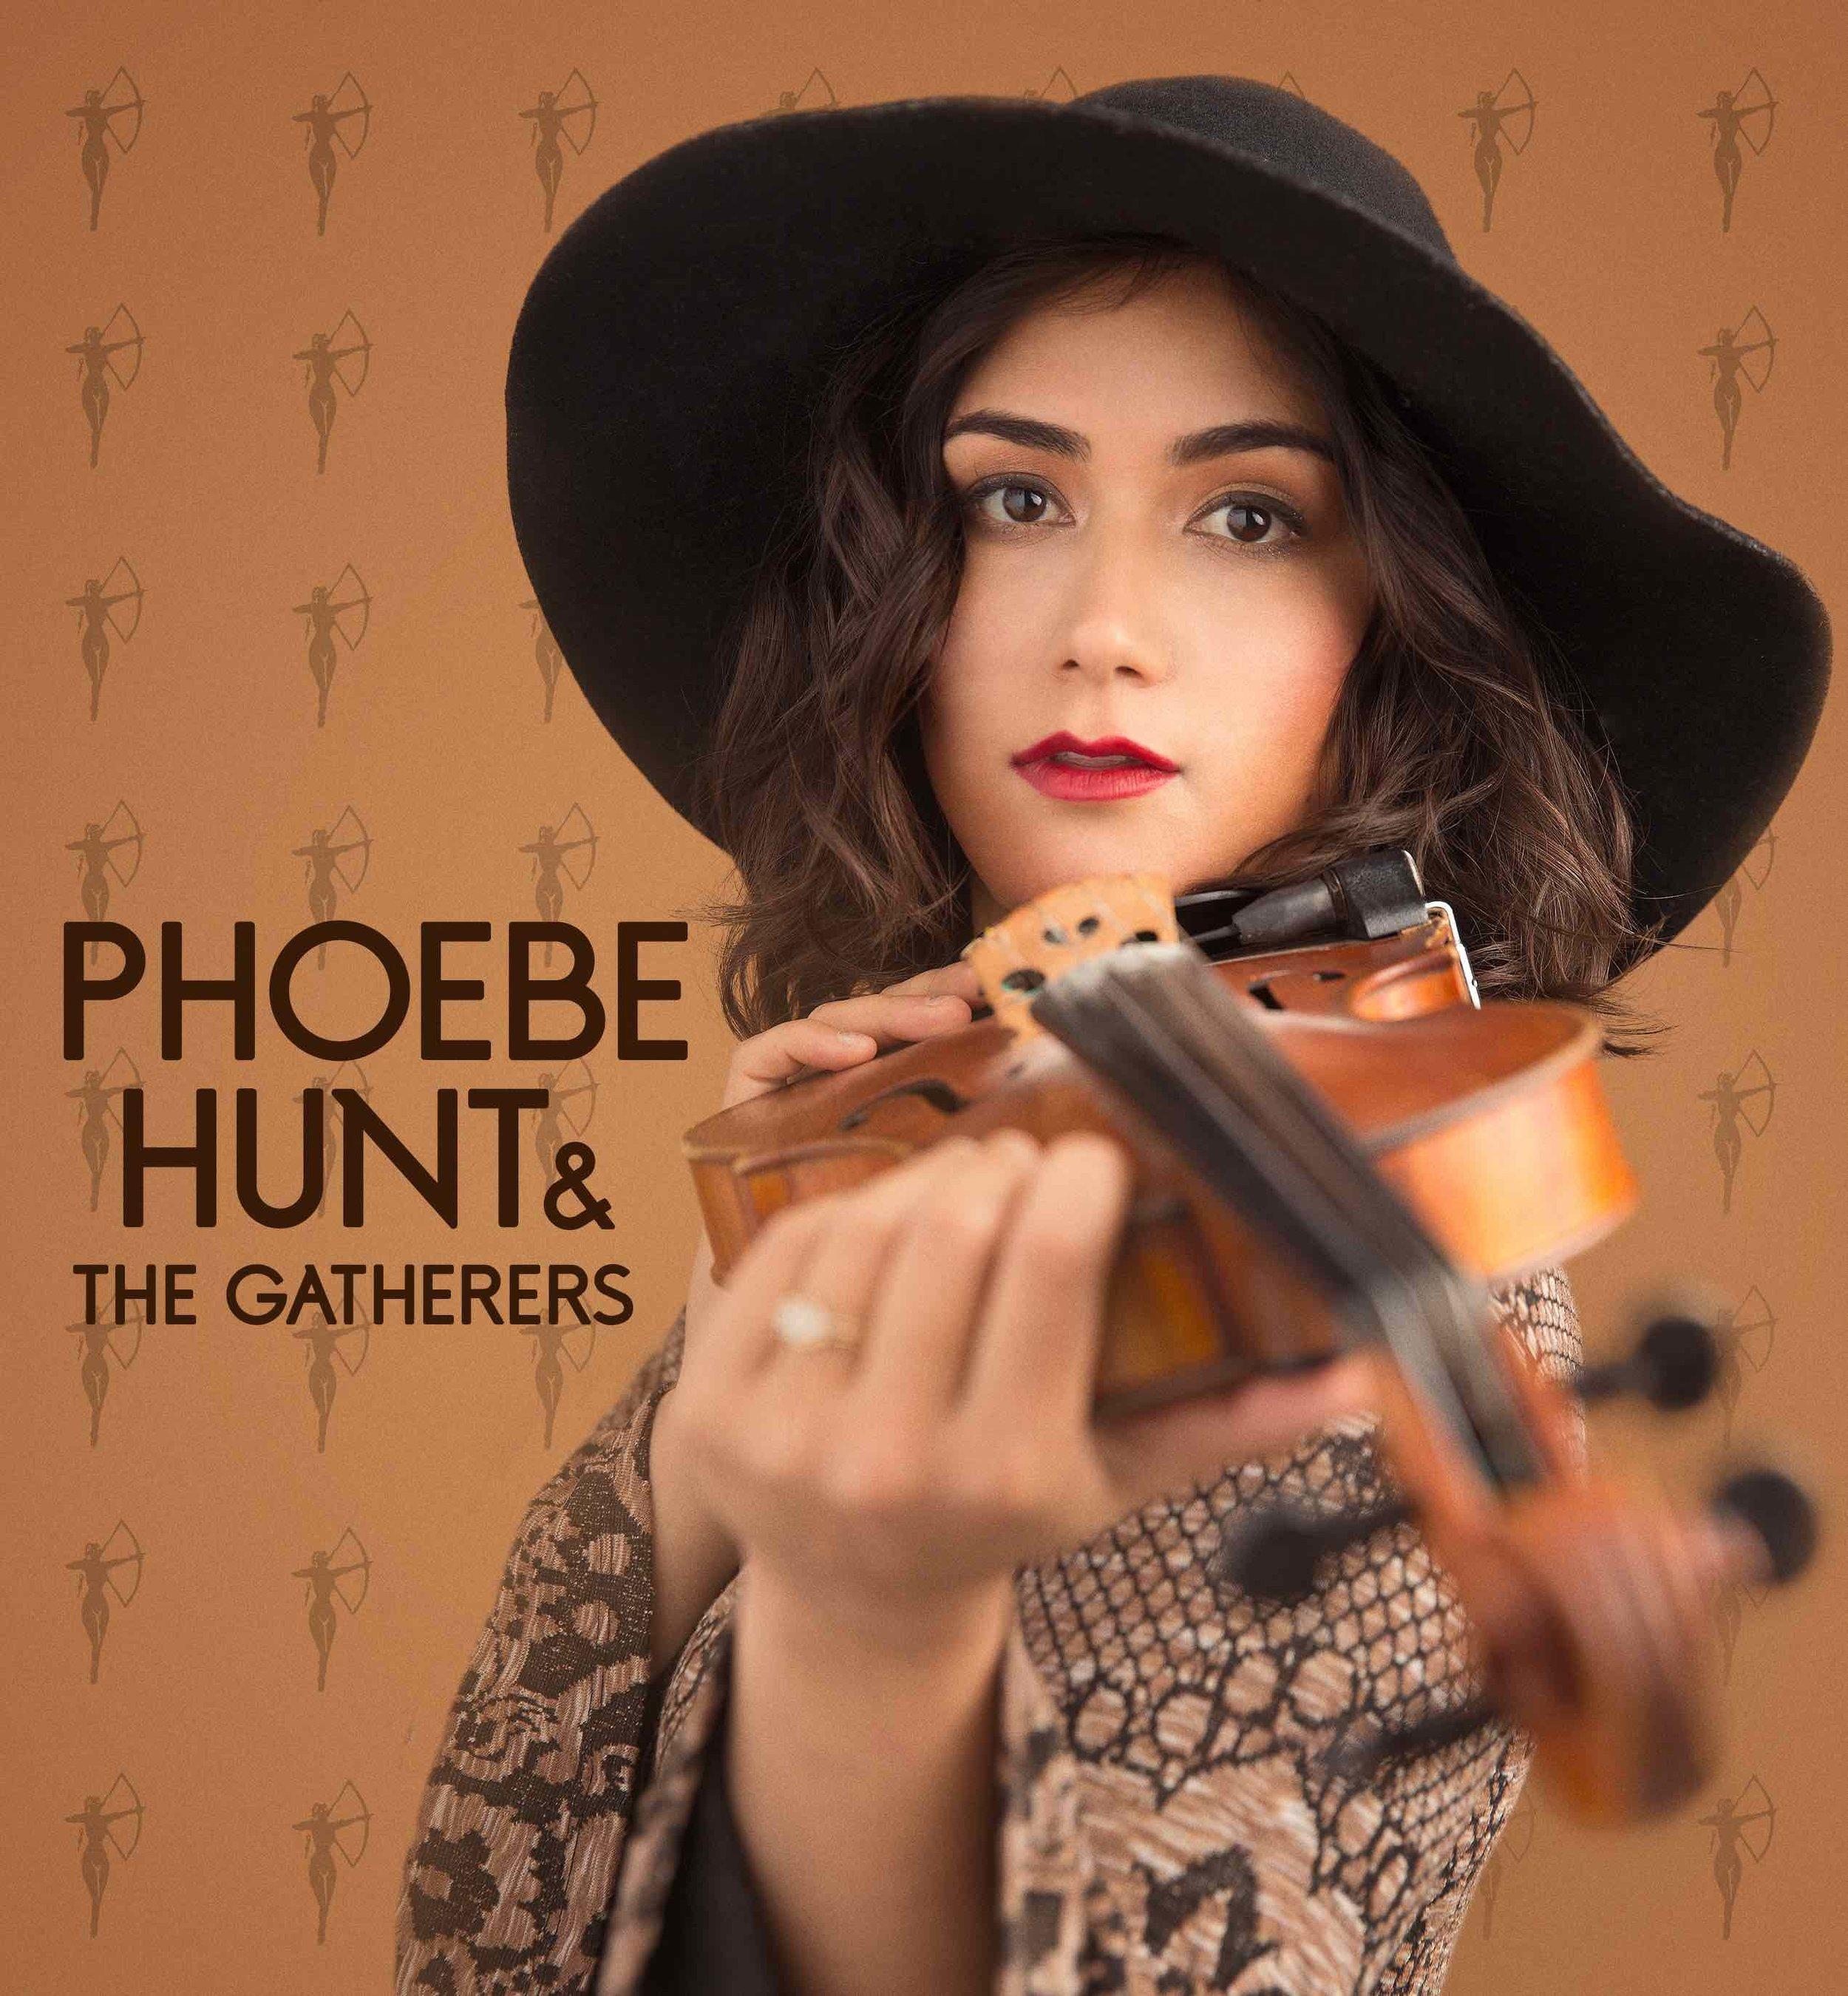 Phoebe Hunt & The Gatherers